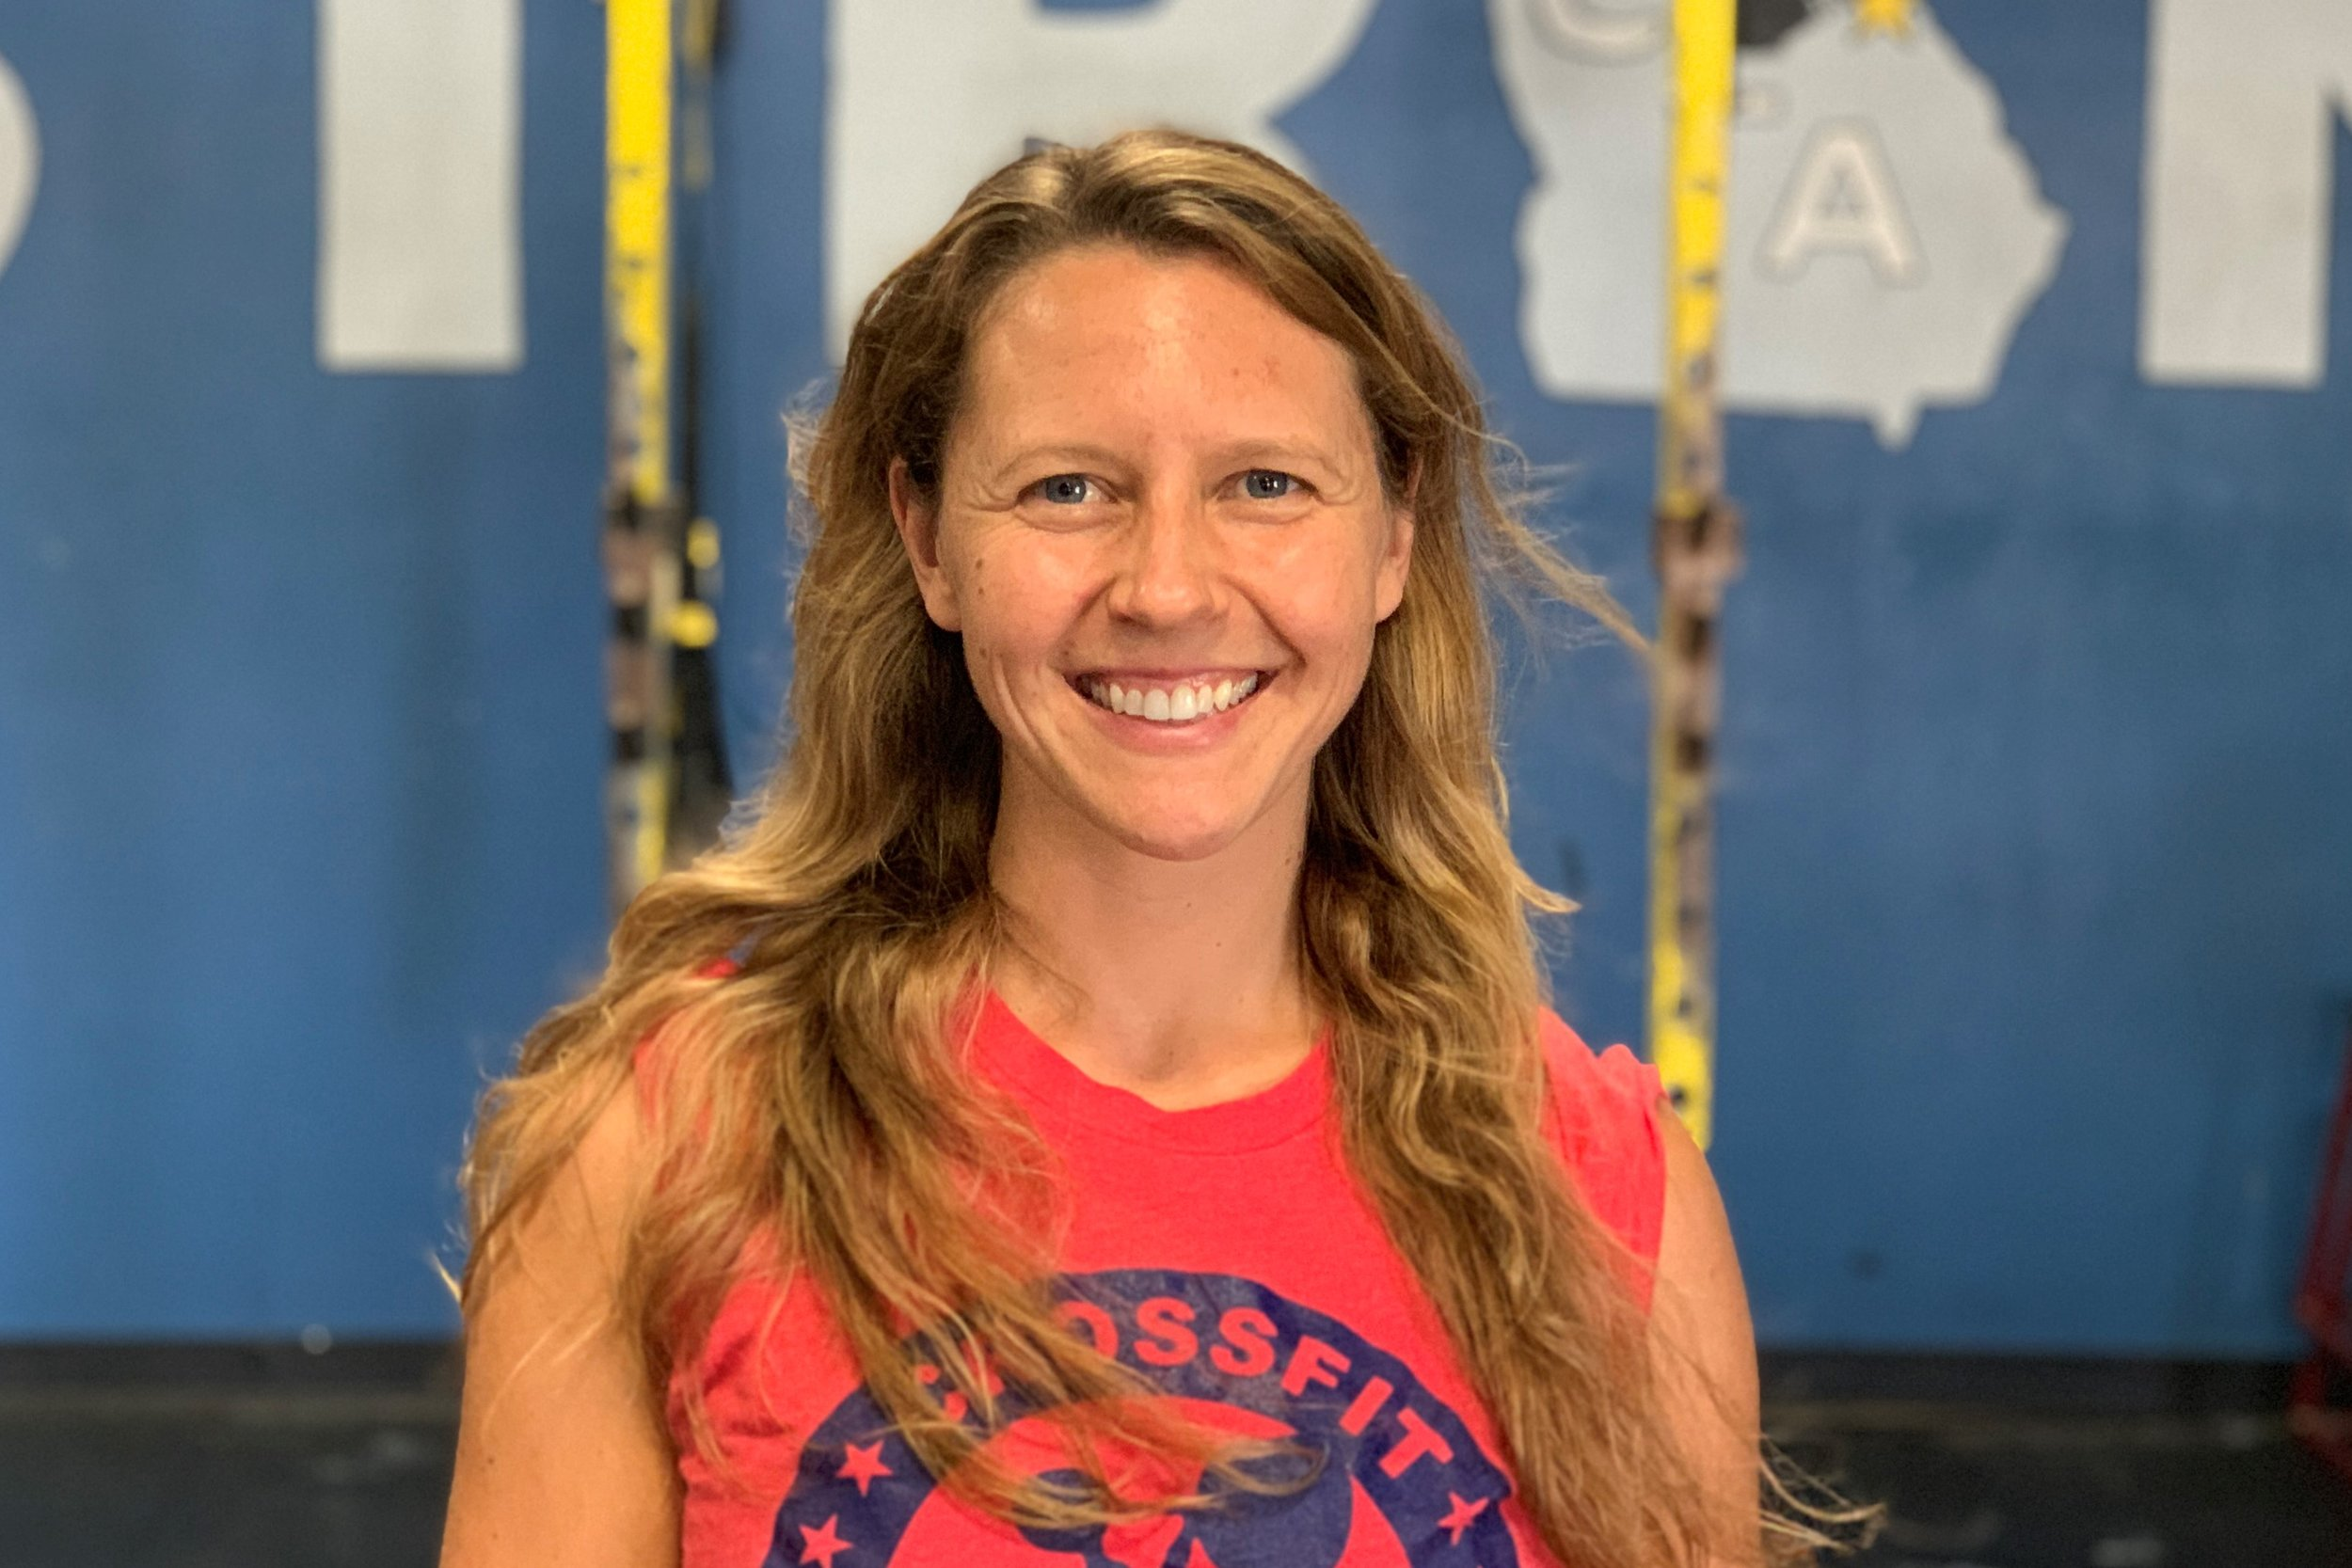 Erica Kolcz - Group Classes, Personal Training, Legends, Corporate Wellness